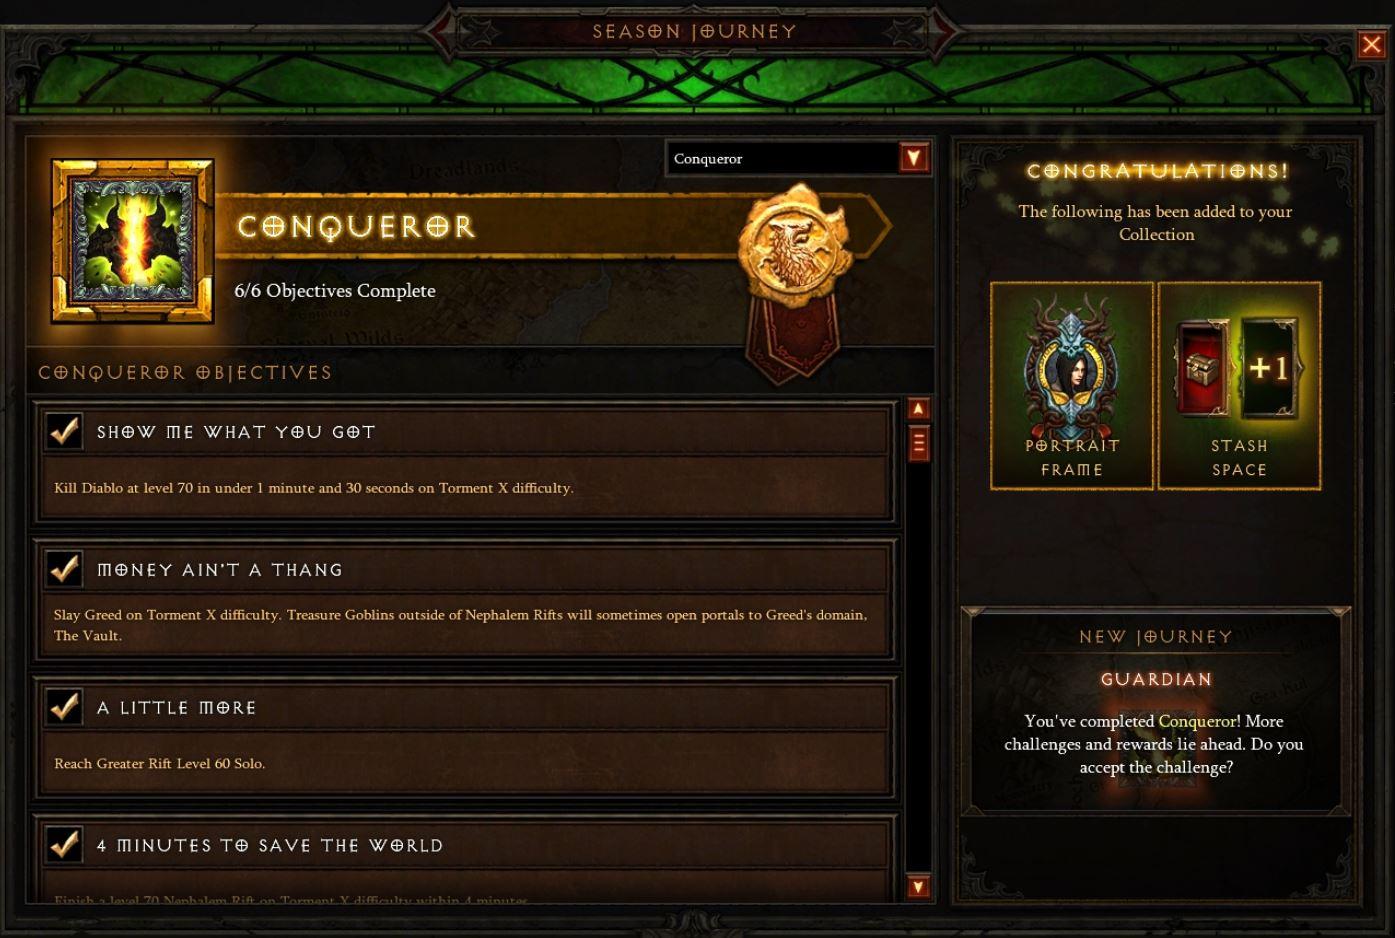 S5 Conqueror Complete